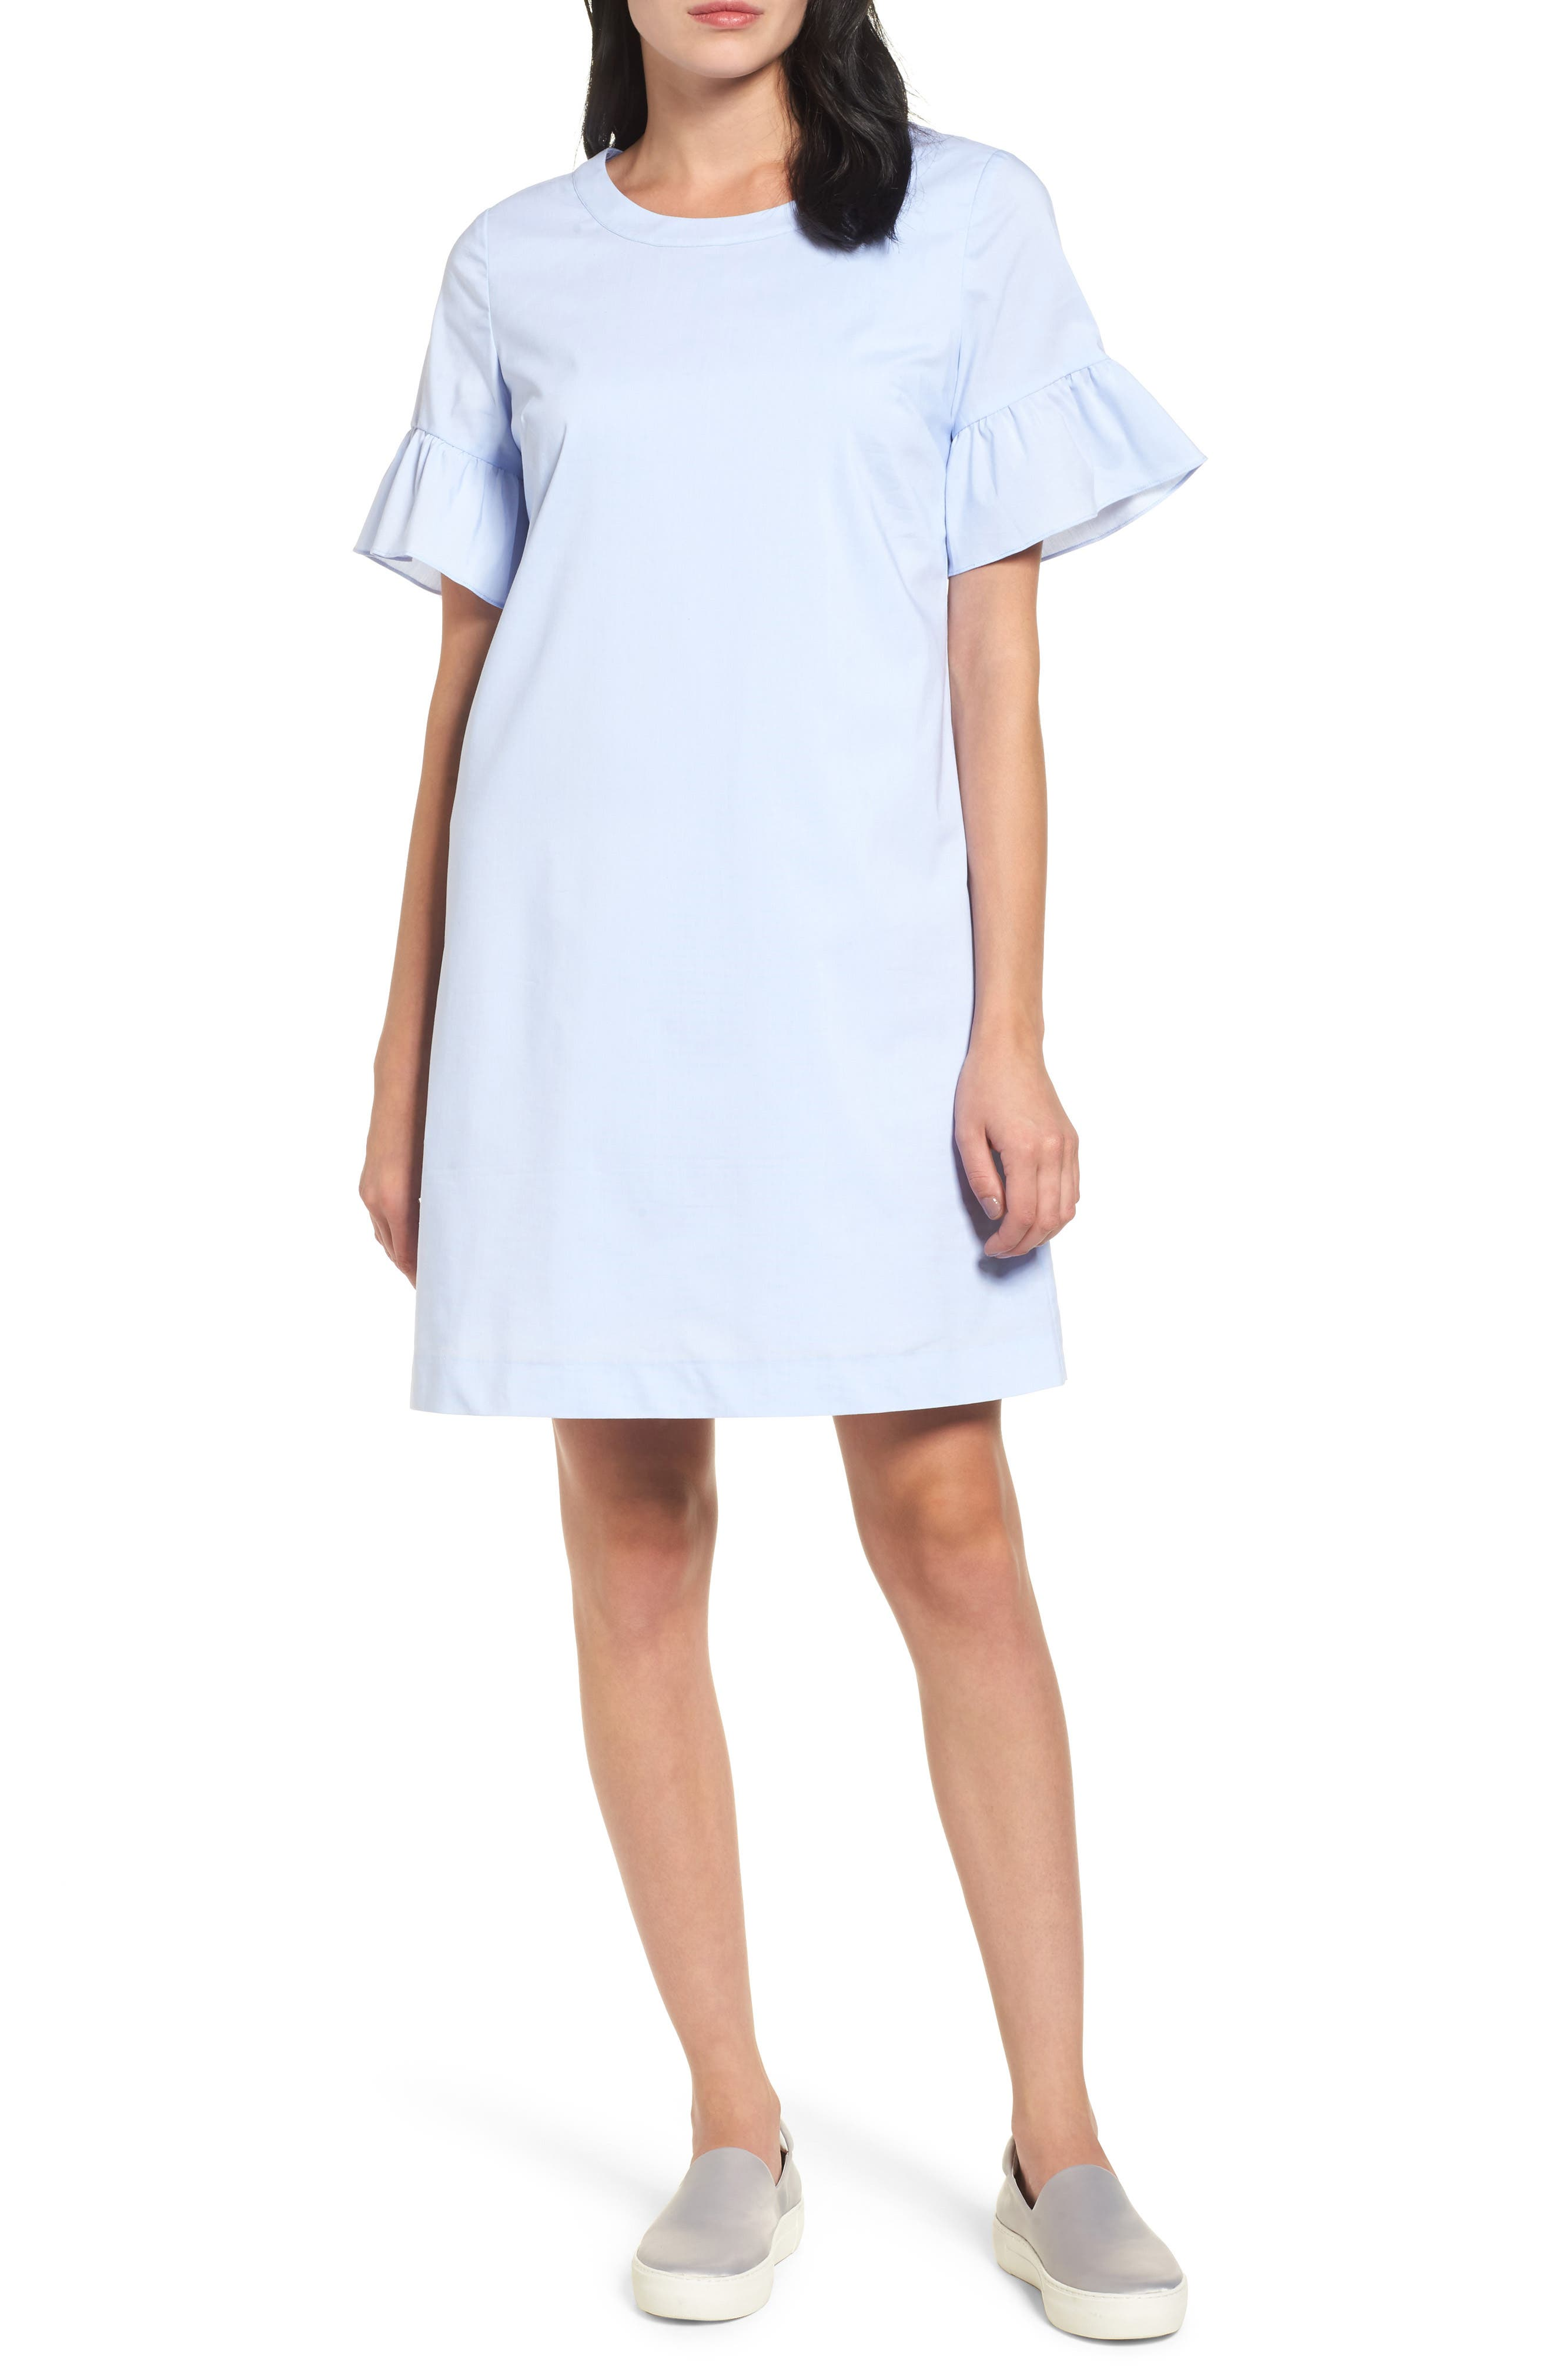 Alternate Image 1 Selected - Halogen® Tie Back Ruffle Sleeve Dress (Regular & Petite)